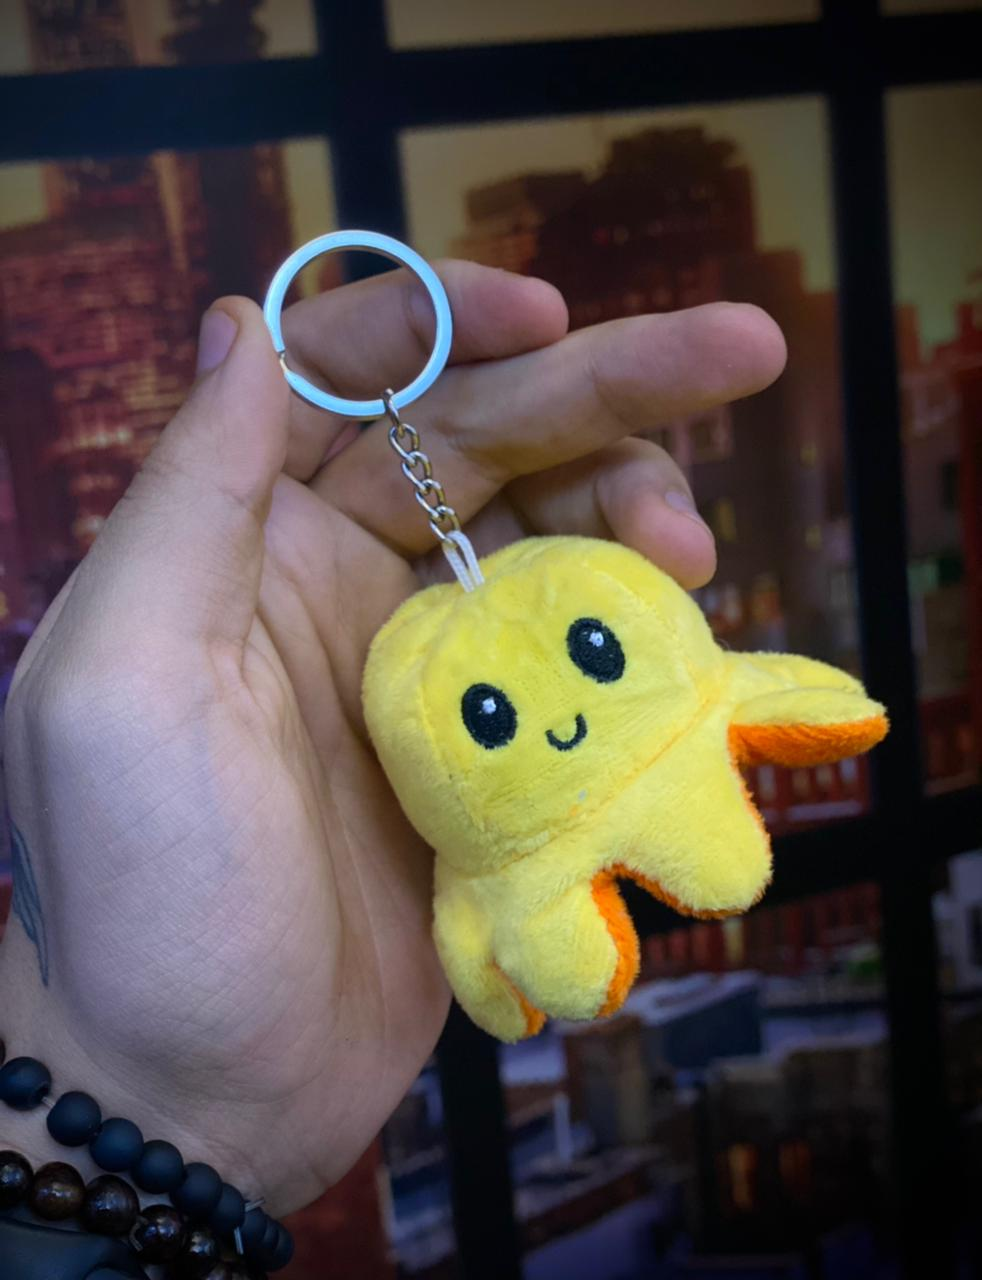 Chaveiro Pelucia Do Humor Polvo Flip Reversivel Laranja e Amarelo: Kawaii Brinquedo Tik Tok 5cm